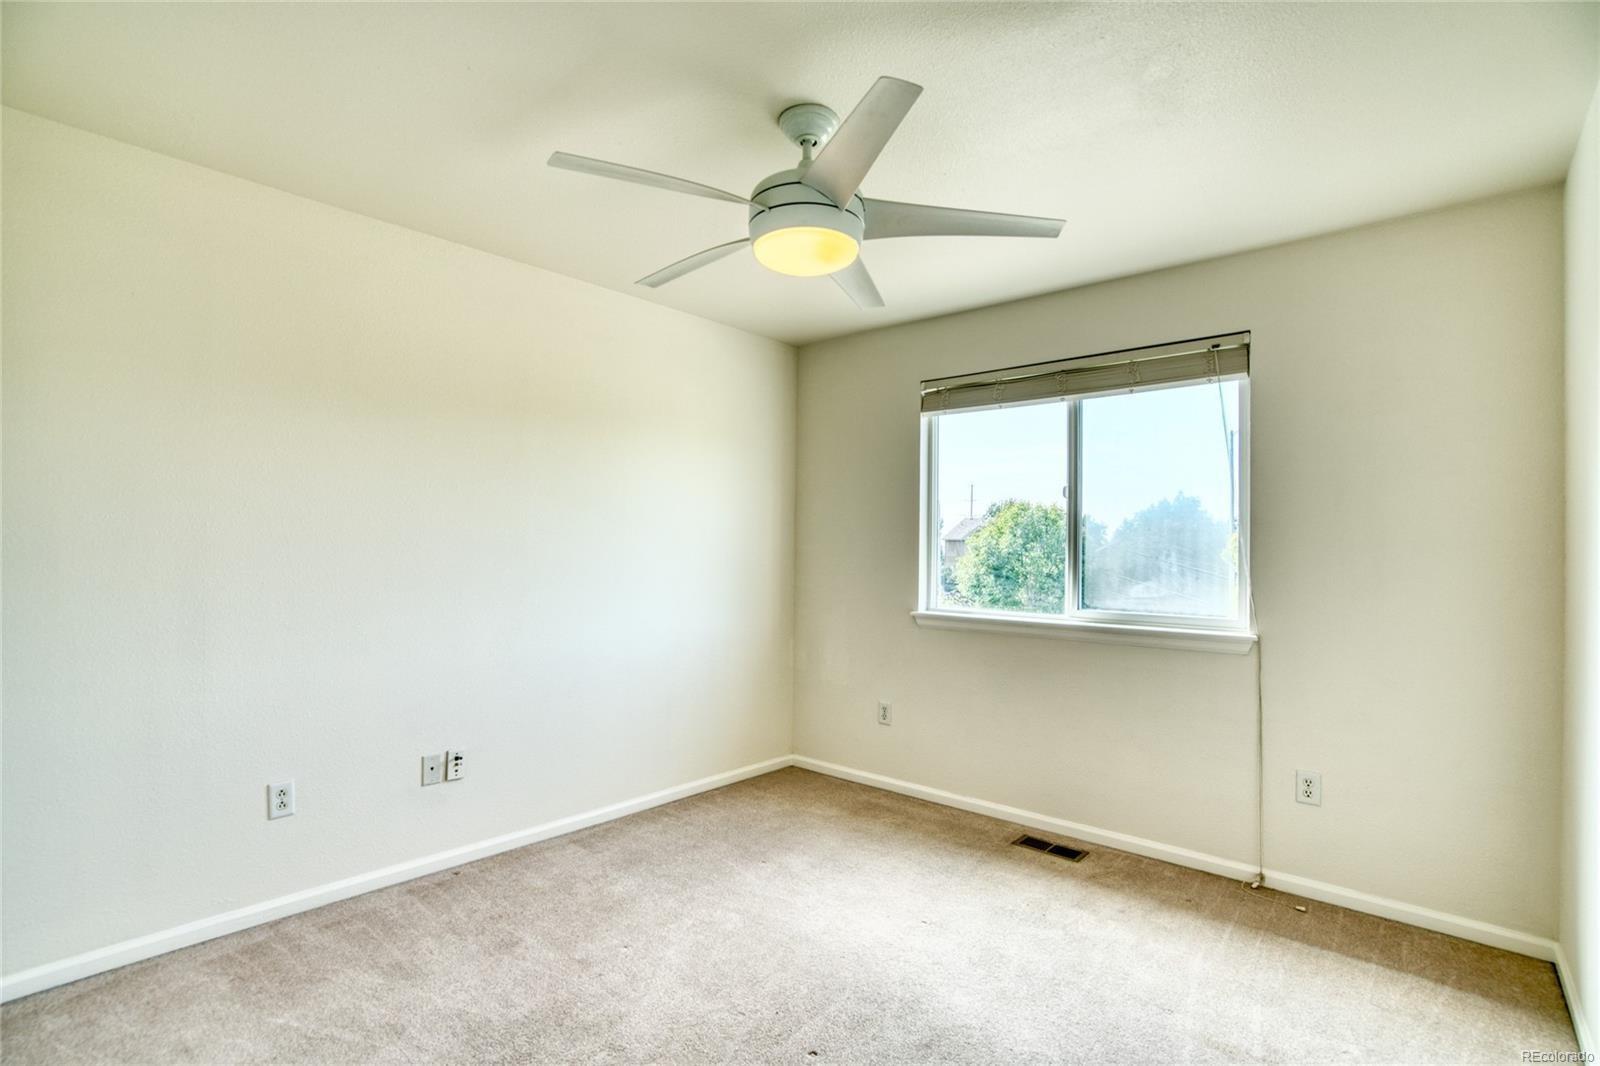 MLS# 7654141 - 18 - 961 Sparrow Hawk Drive, Longmont, CO 80504